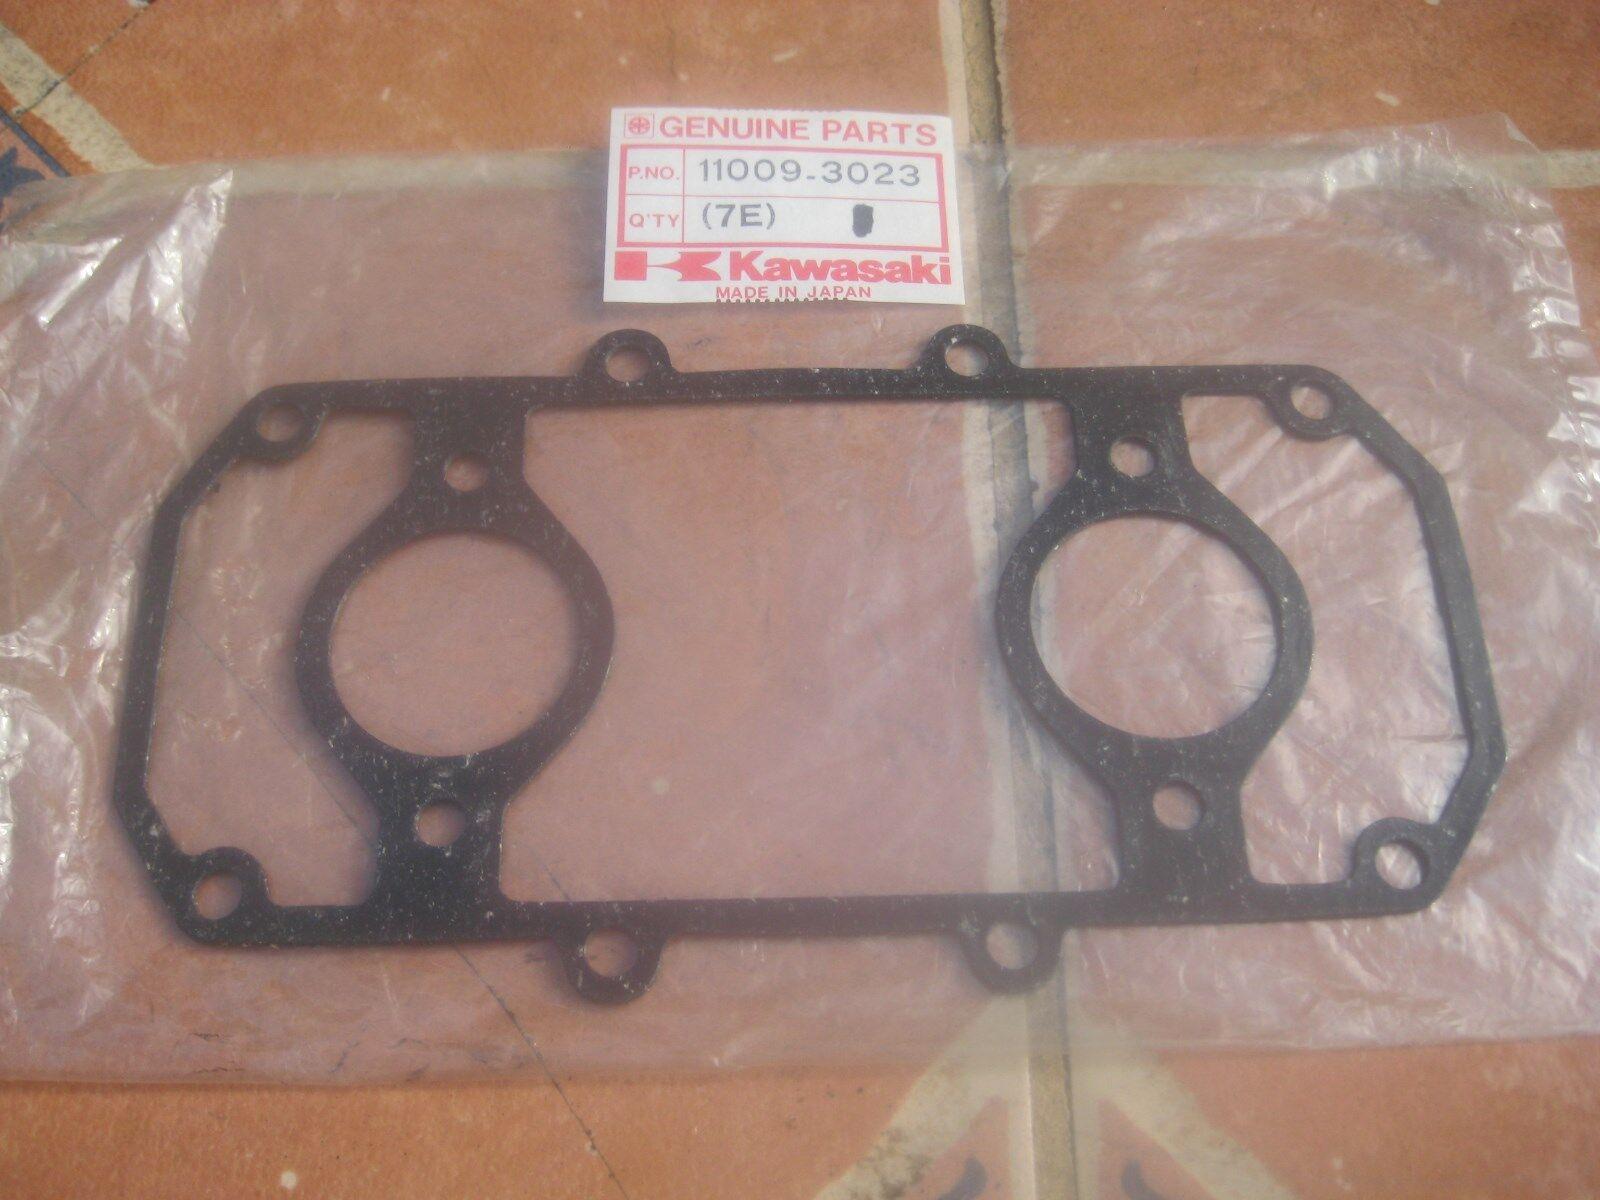 Kawasaki 440 550 JS SX OEM Exhaust Manifold Gasket Genuine Part #11009-3023